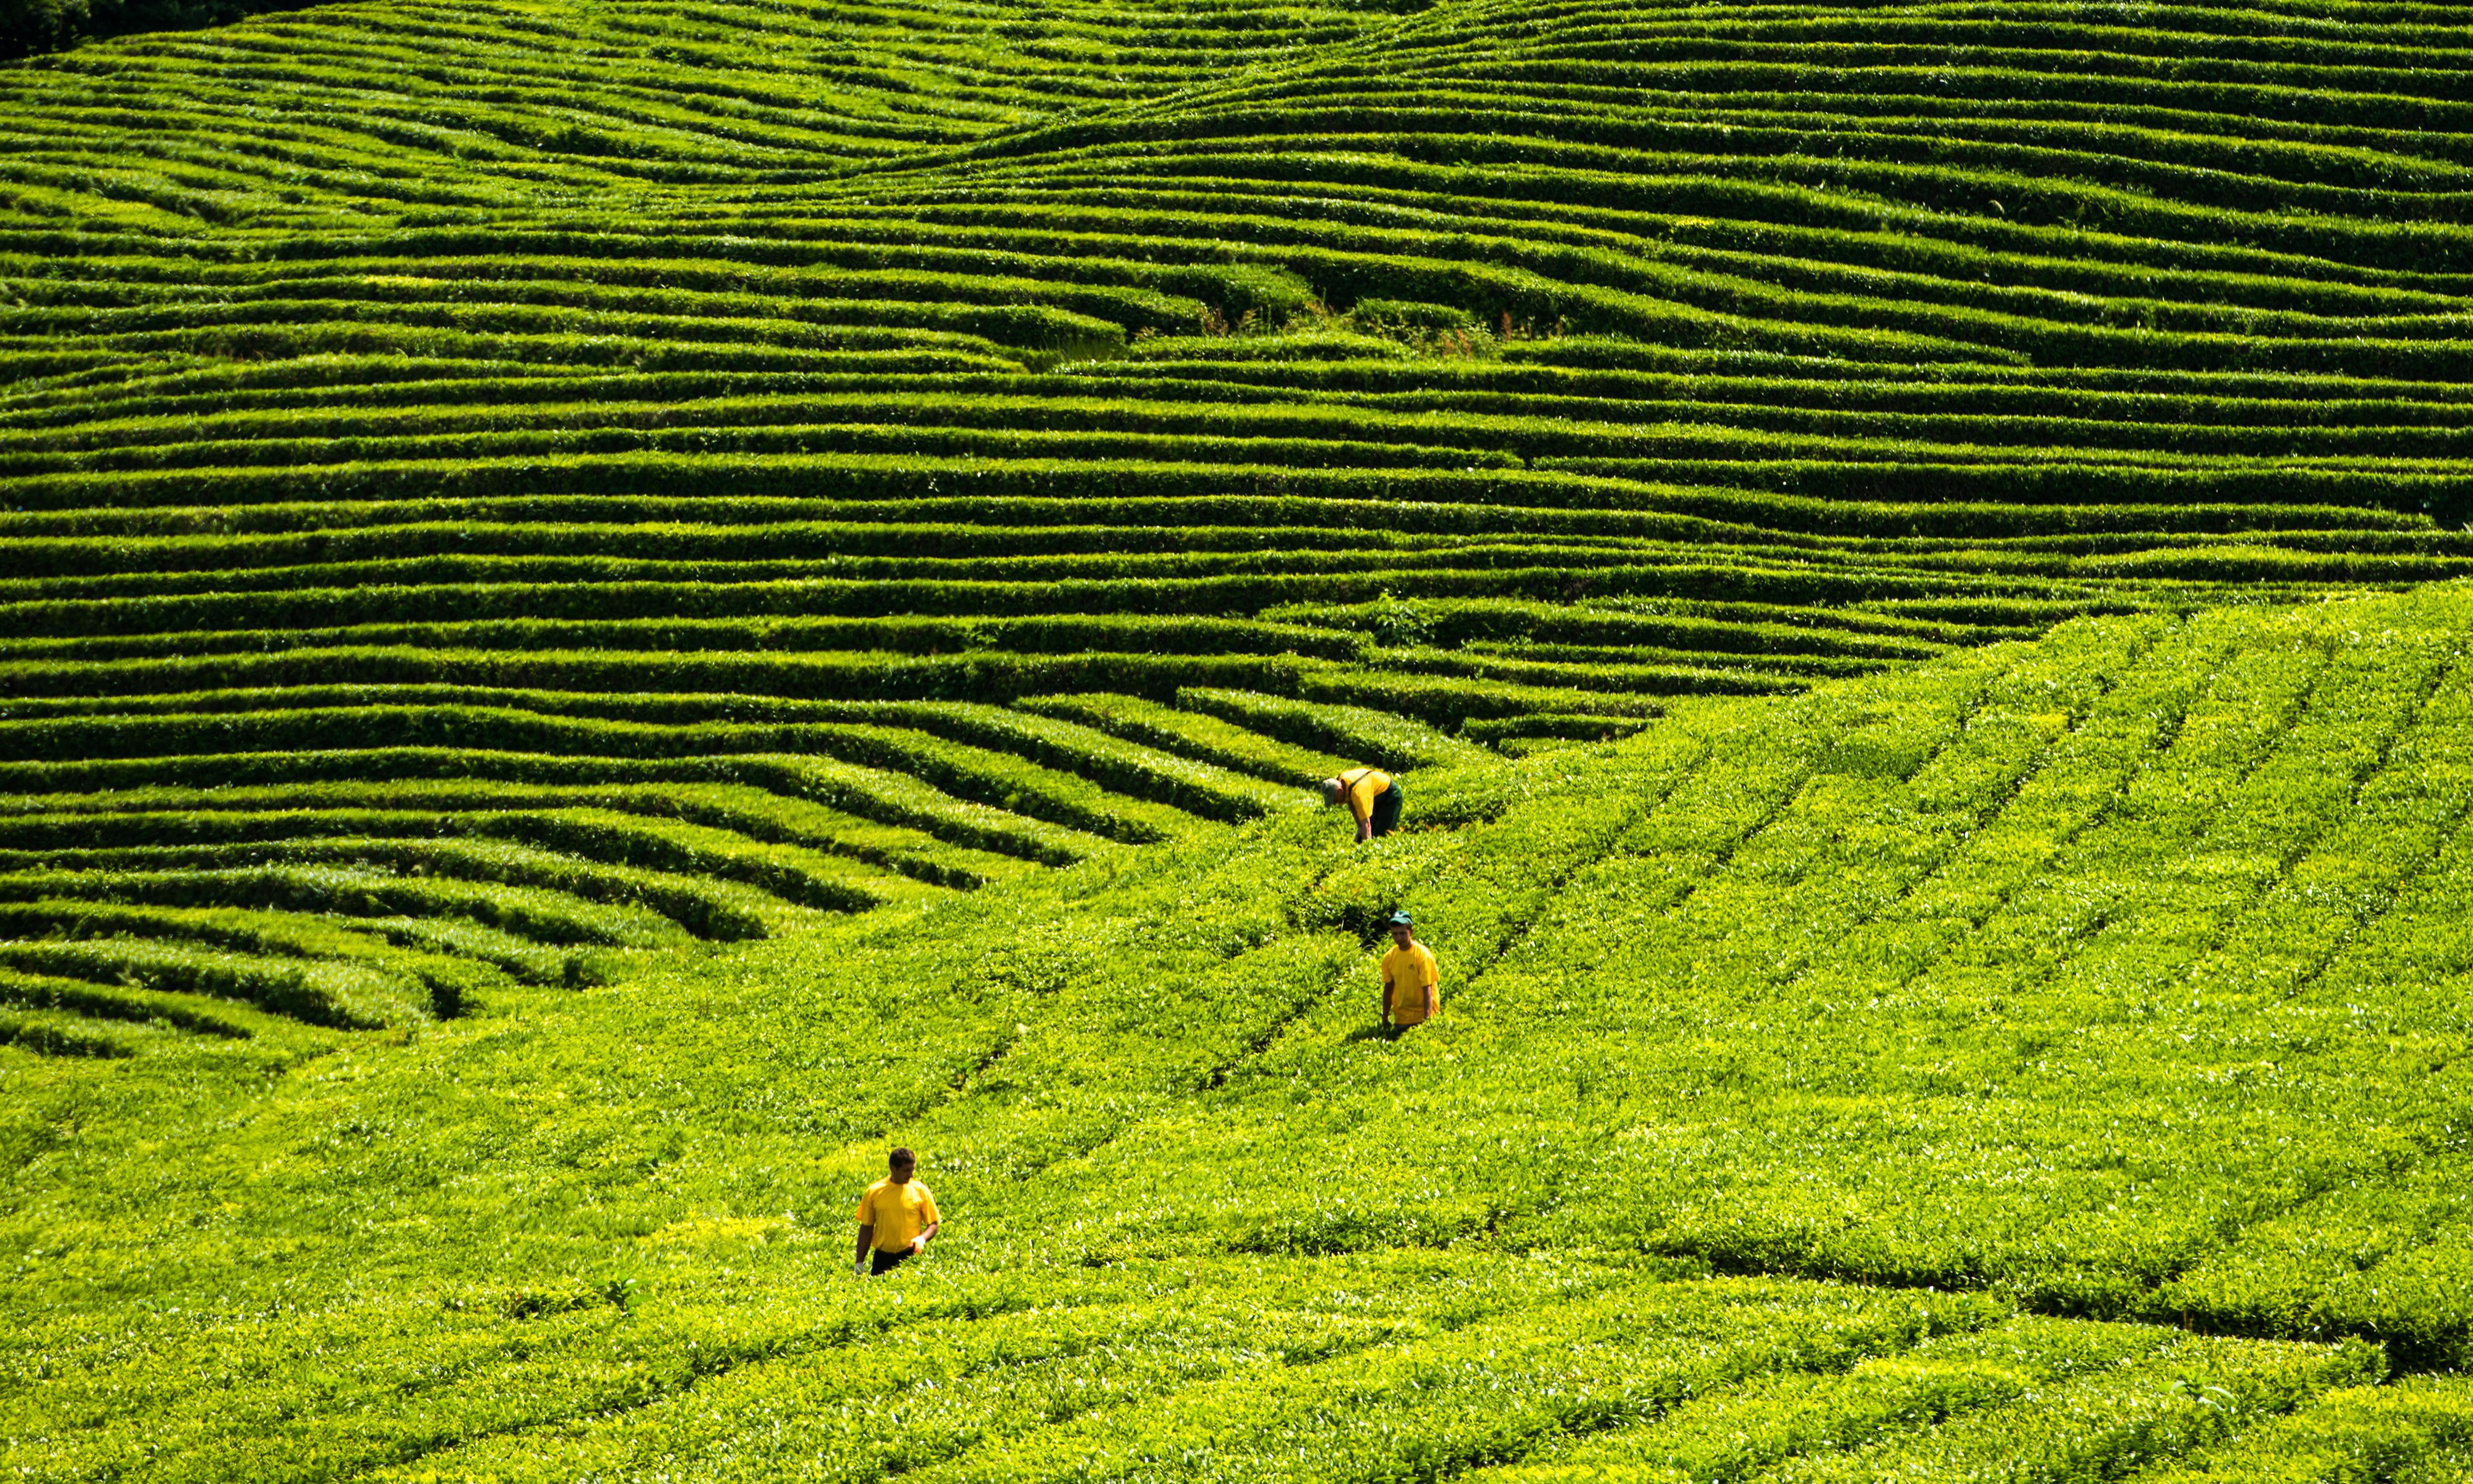 Green tea may help reduce risk of heart attacks